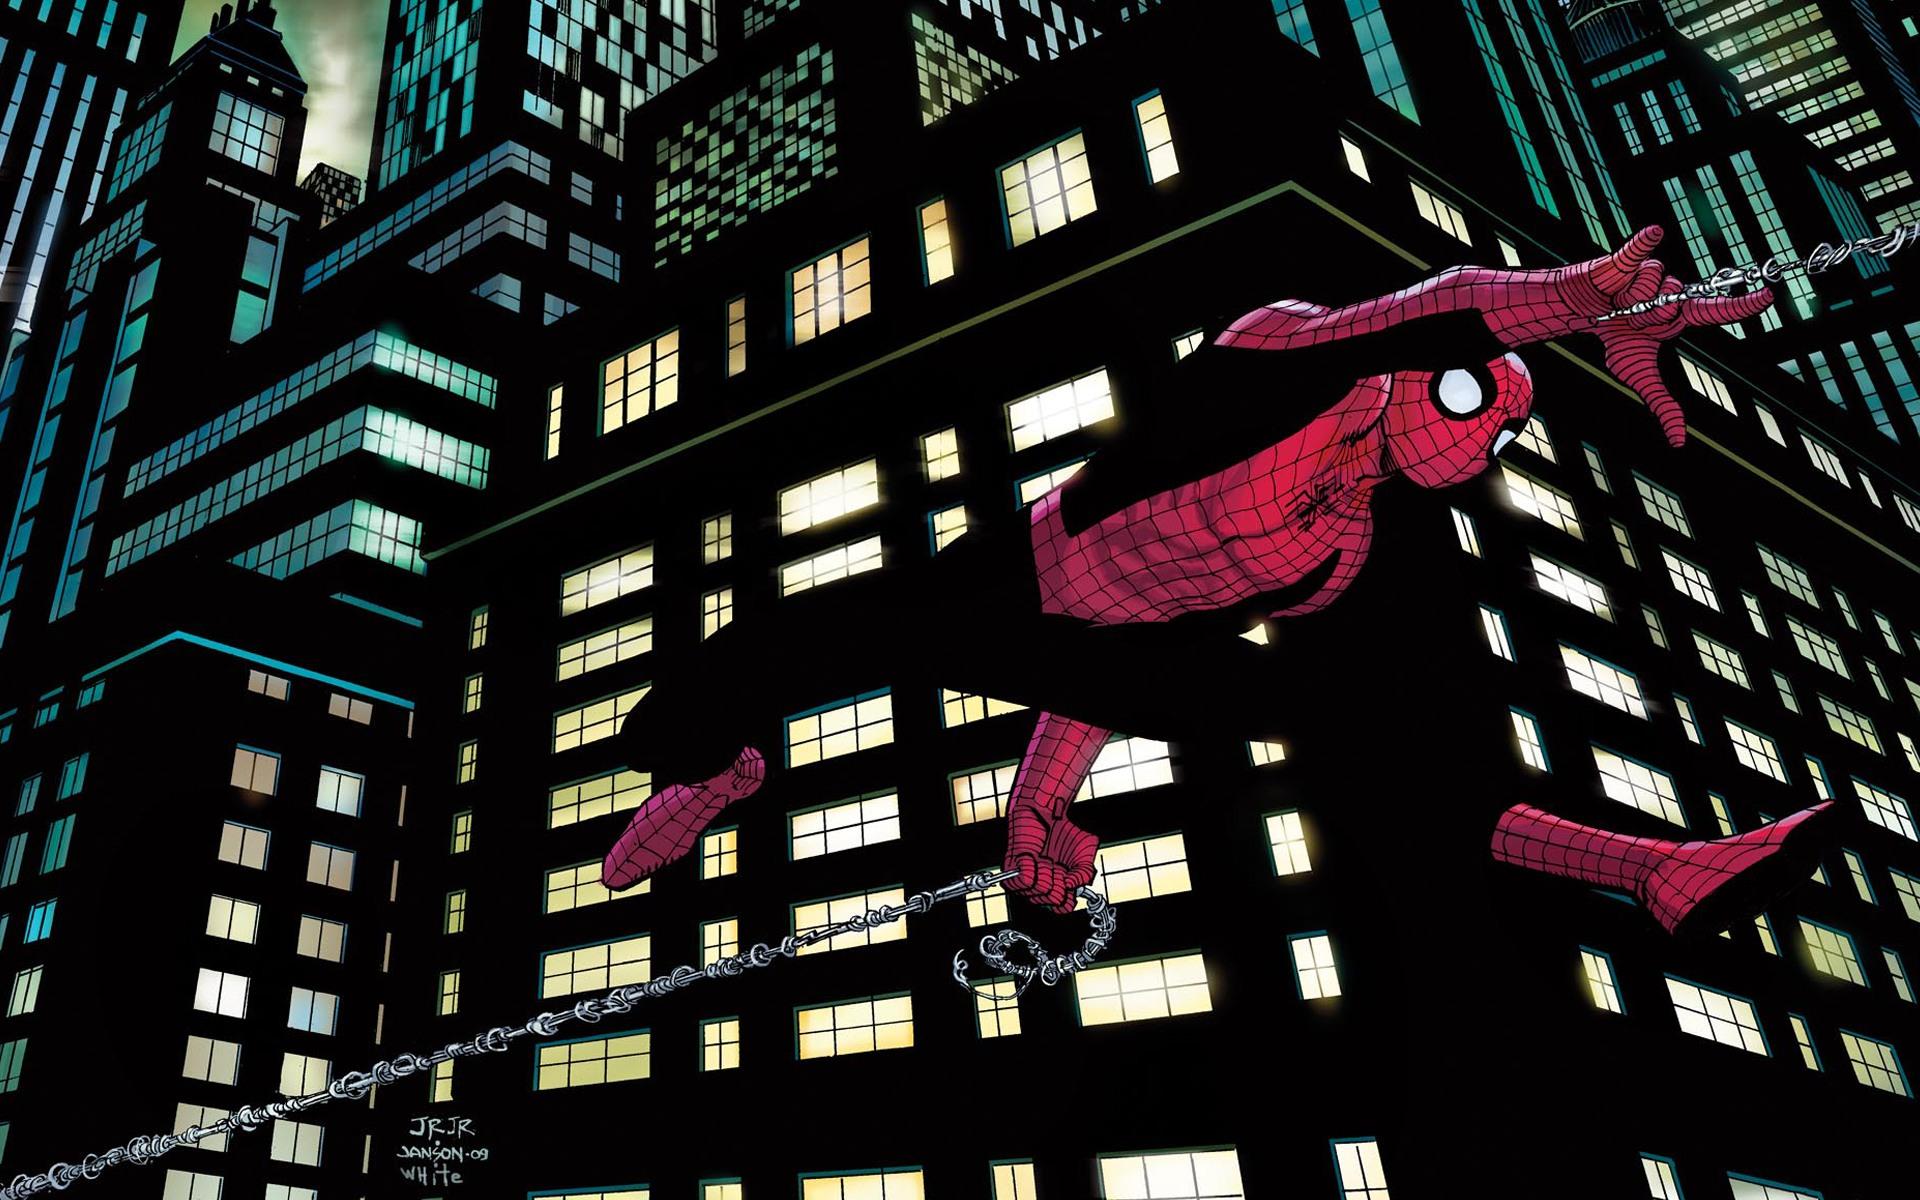 Wallpaper : illustration, cityscape, skyscraper, superhero, Marvel